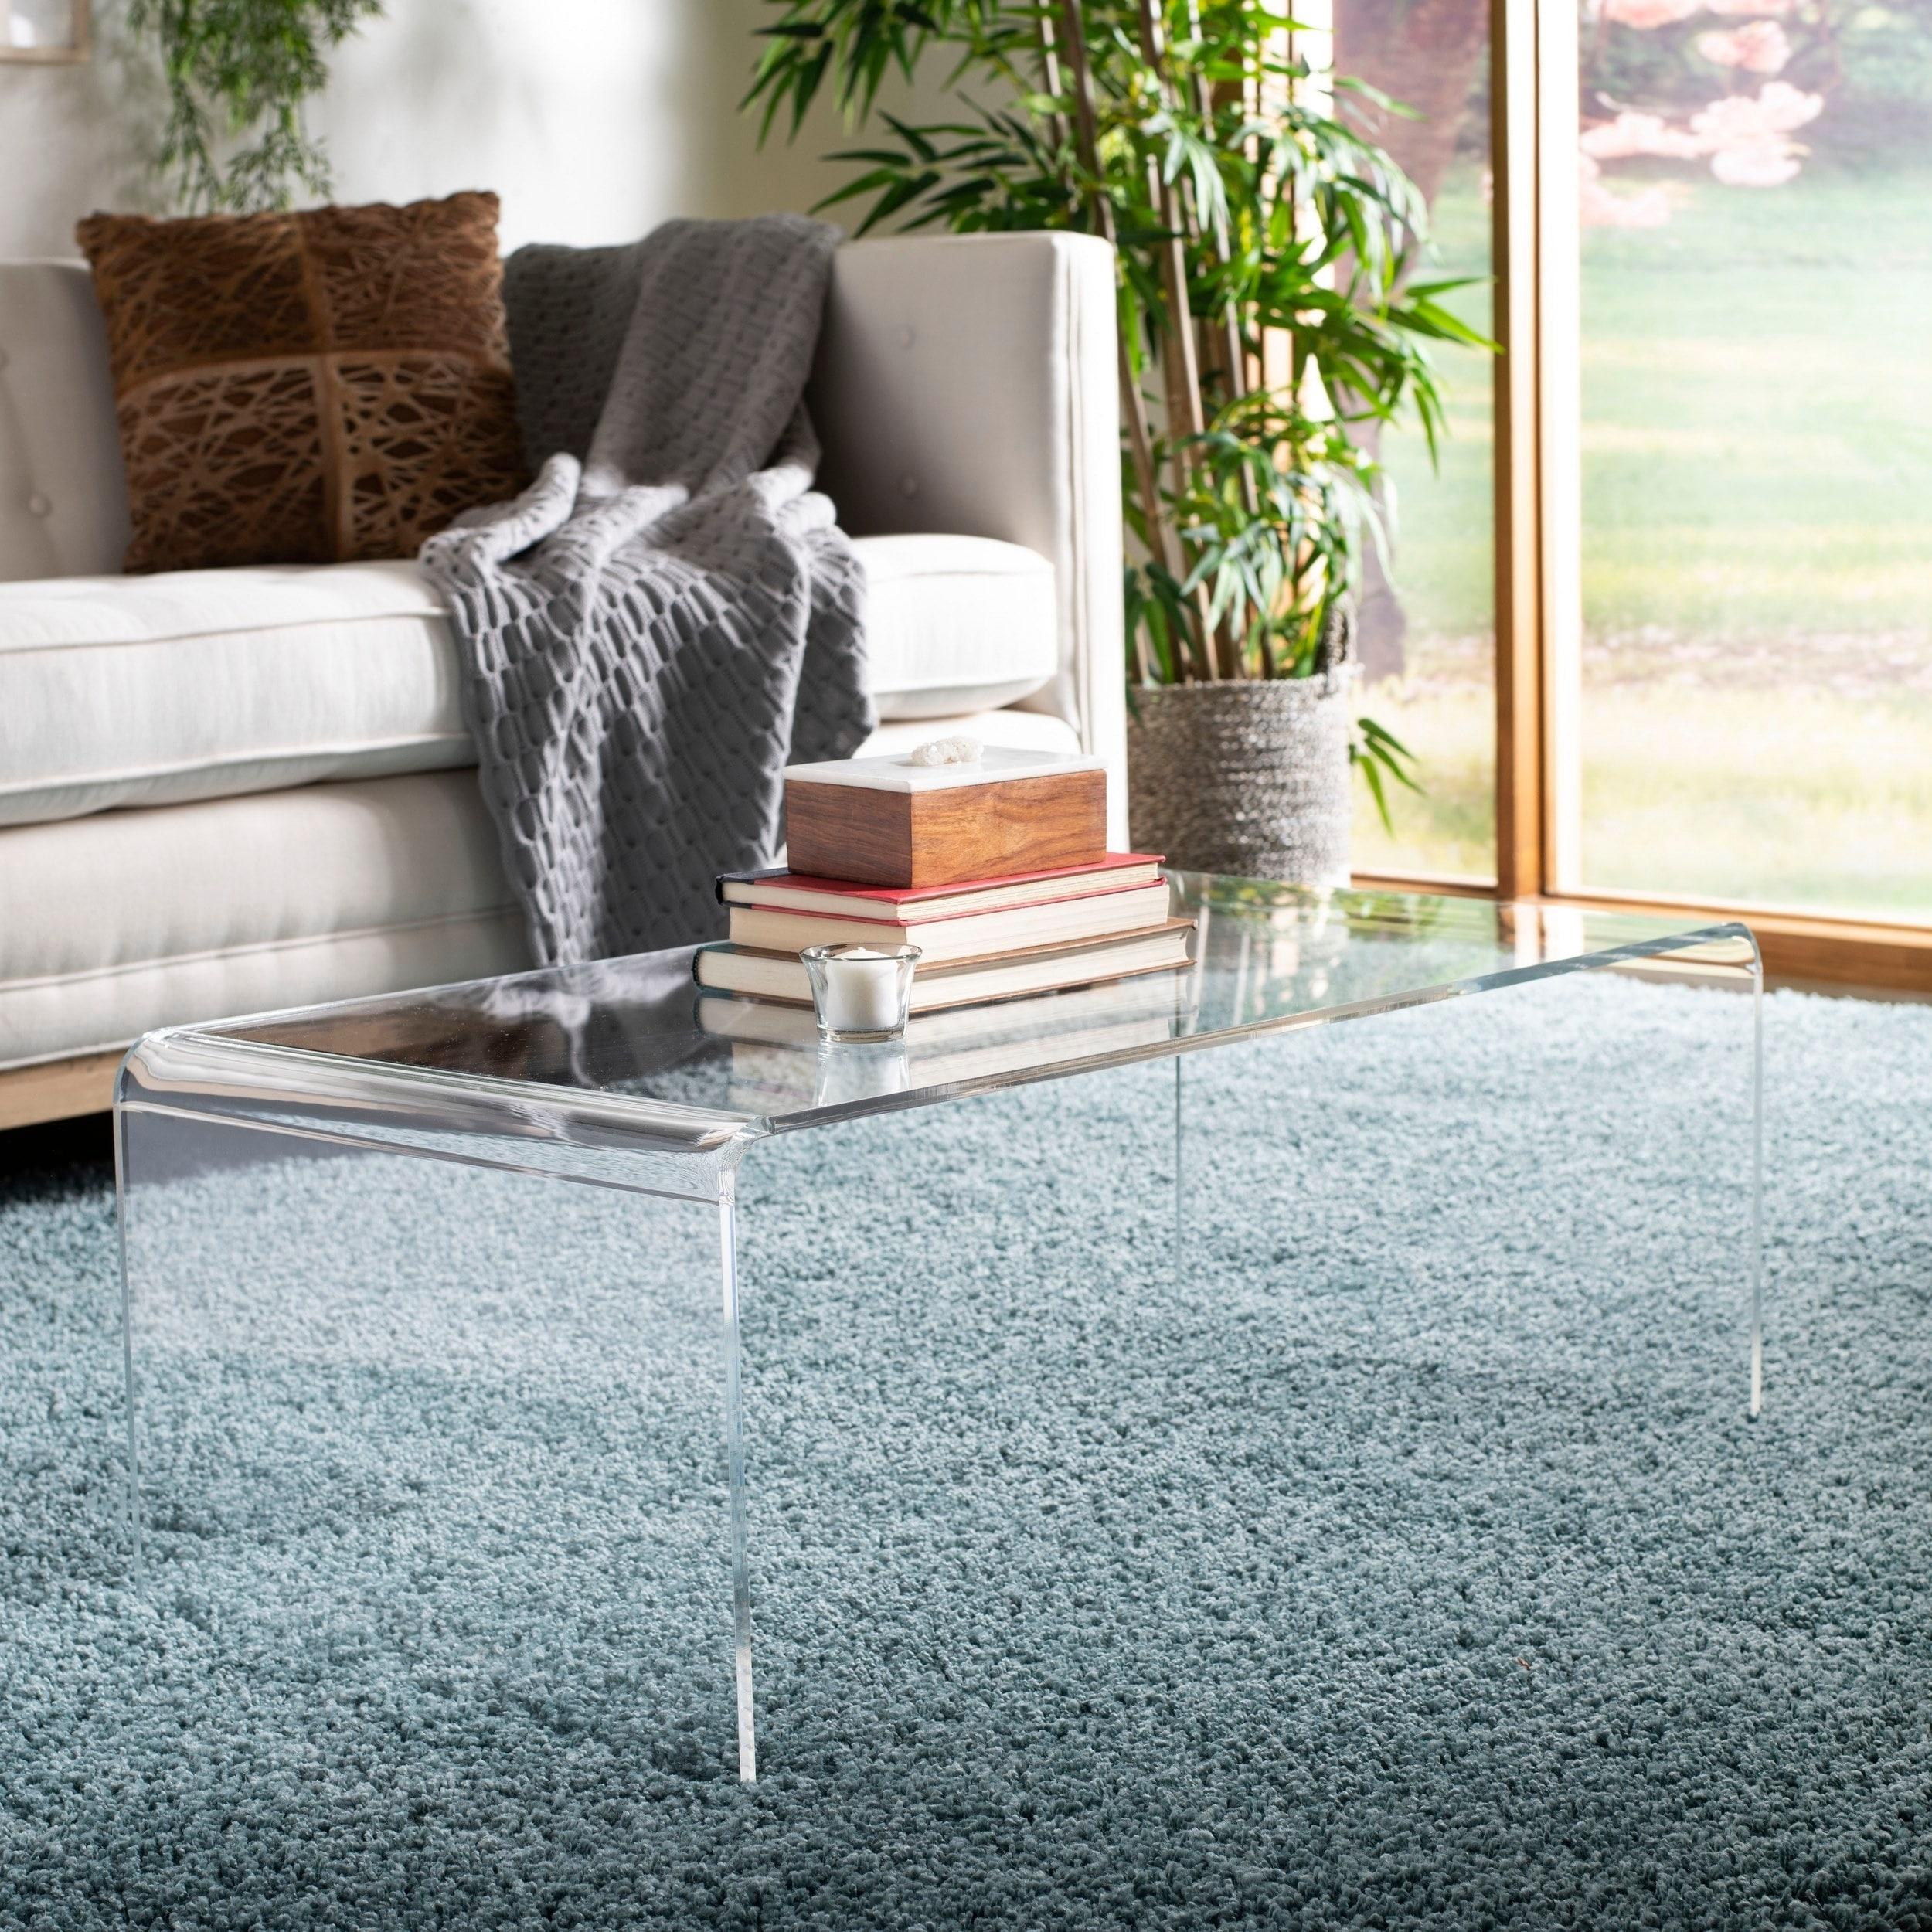 Safavieh Atka Clear Acrylic Coffee Table 35 4 X 17 7 X 13 8